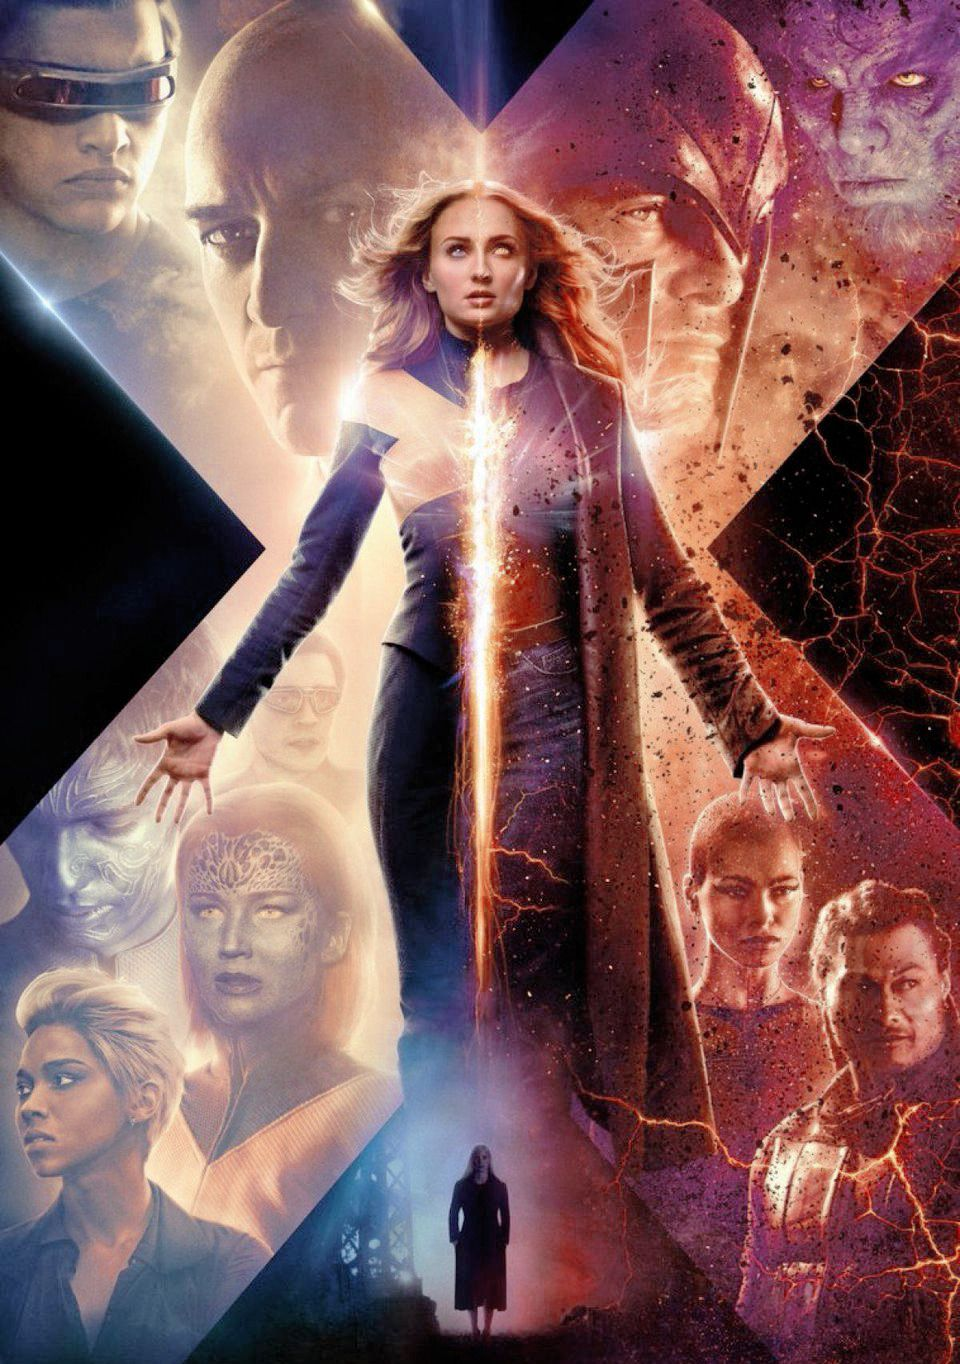 Pin By Juan Anaya On Jean Dark Phoenix Full Movies Free Movies Online